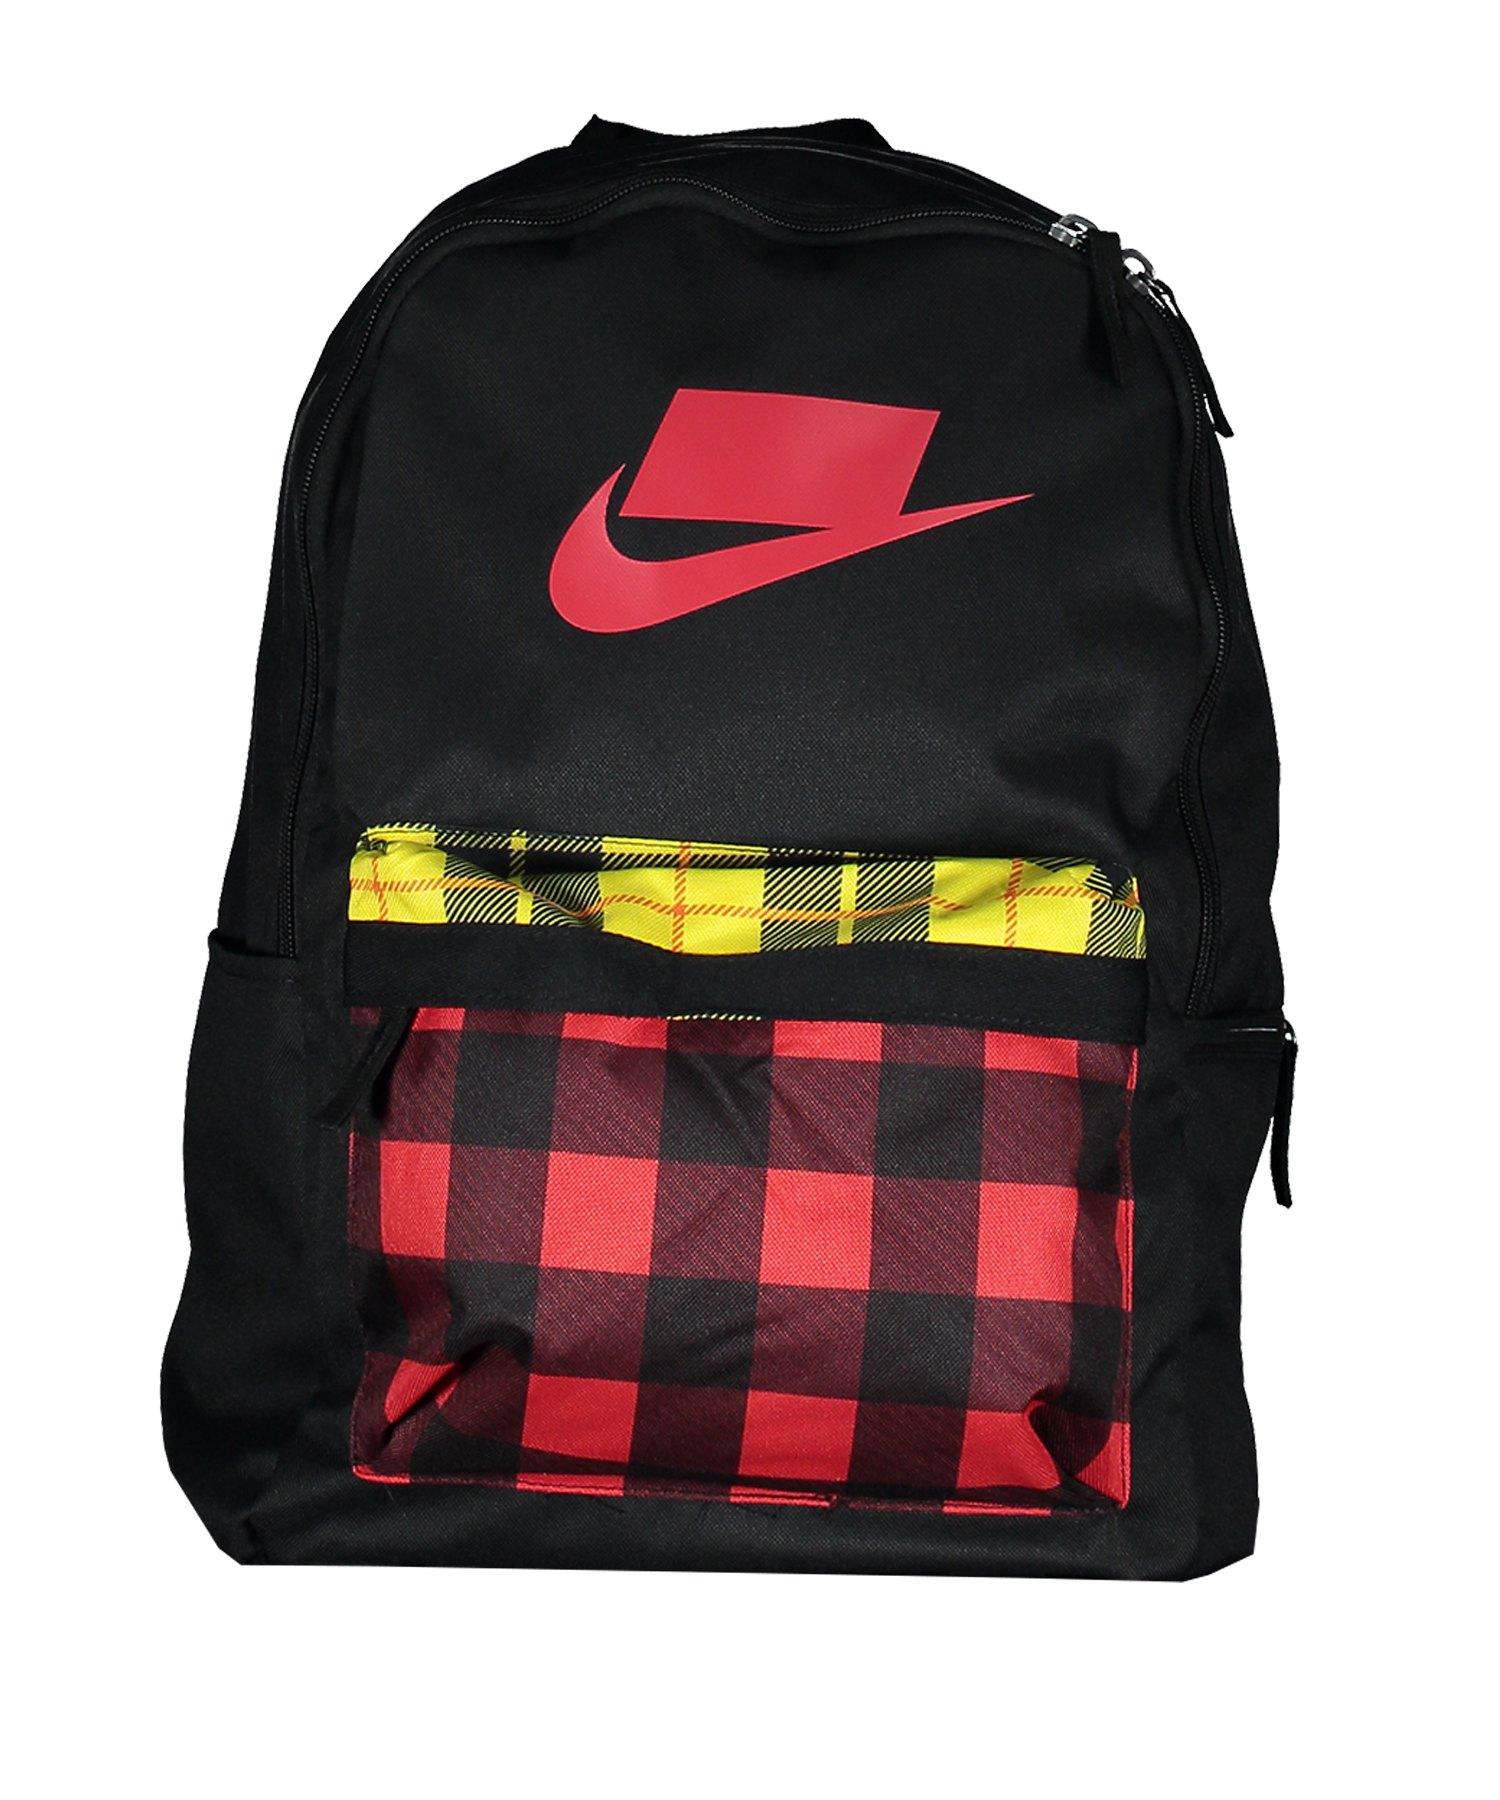 Nike Heritage 2.0 Backpack Rucksack Schwarz F010 - schwarz